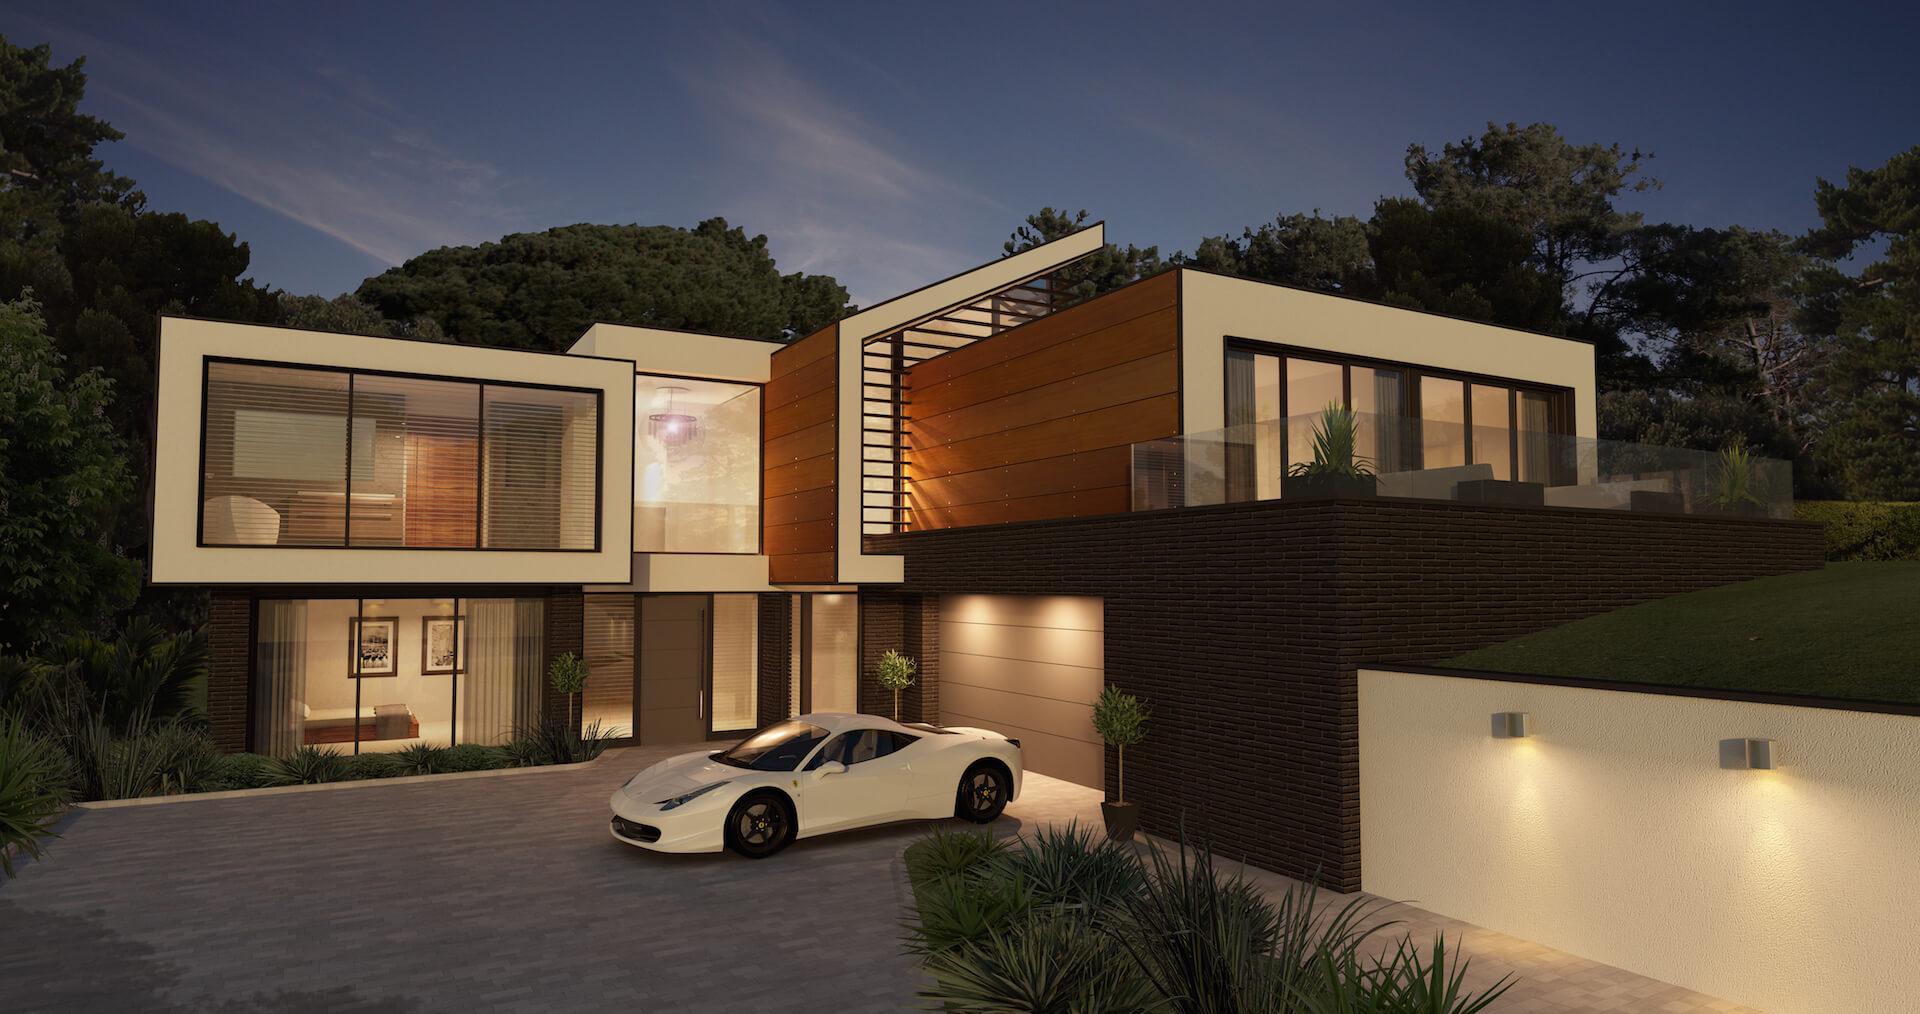 Intriguing b house by artigas arquitectes for Home stratosphere s interior design software free